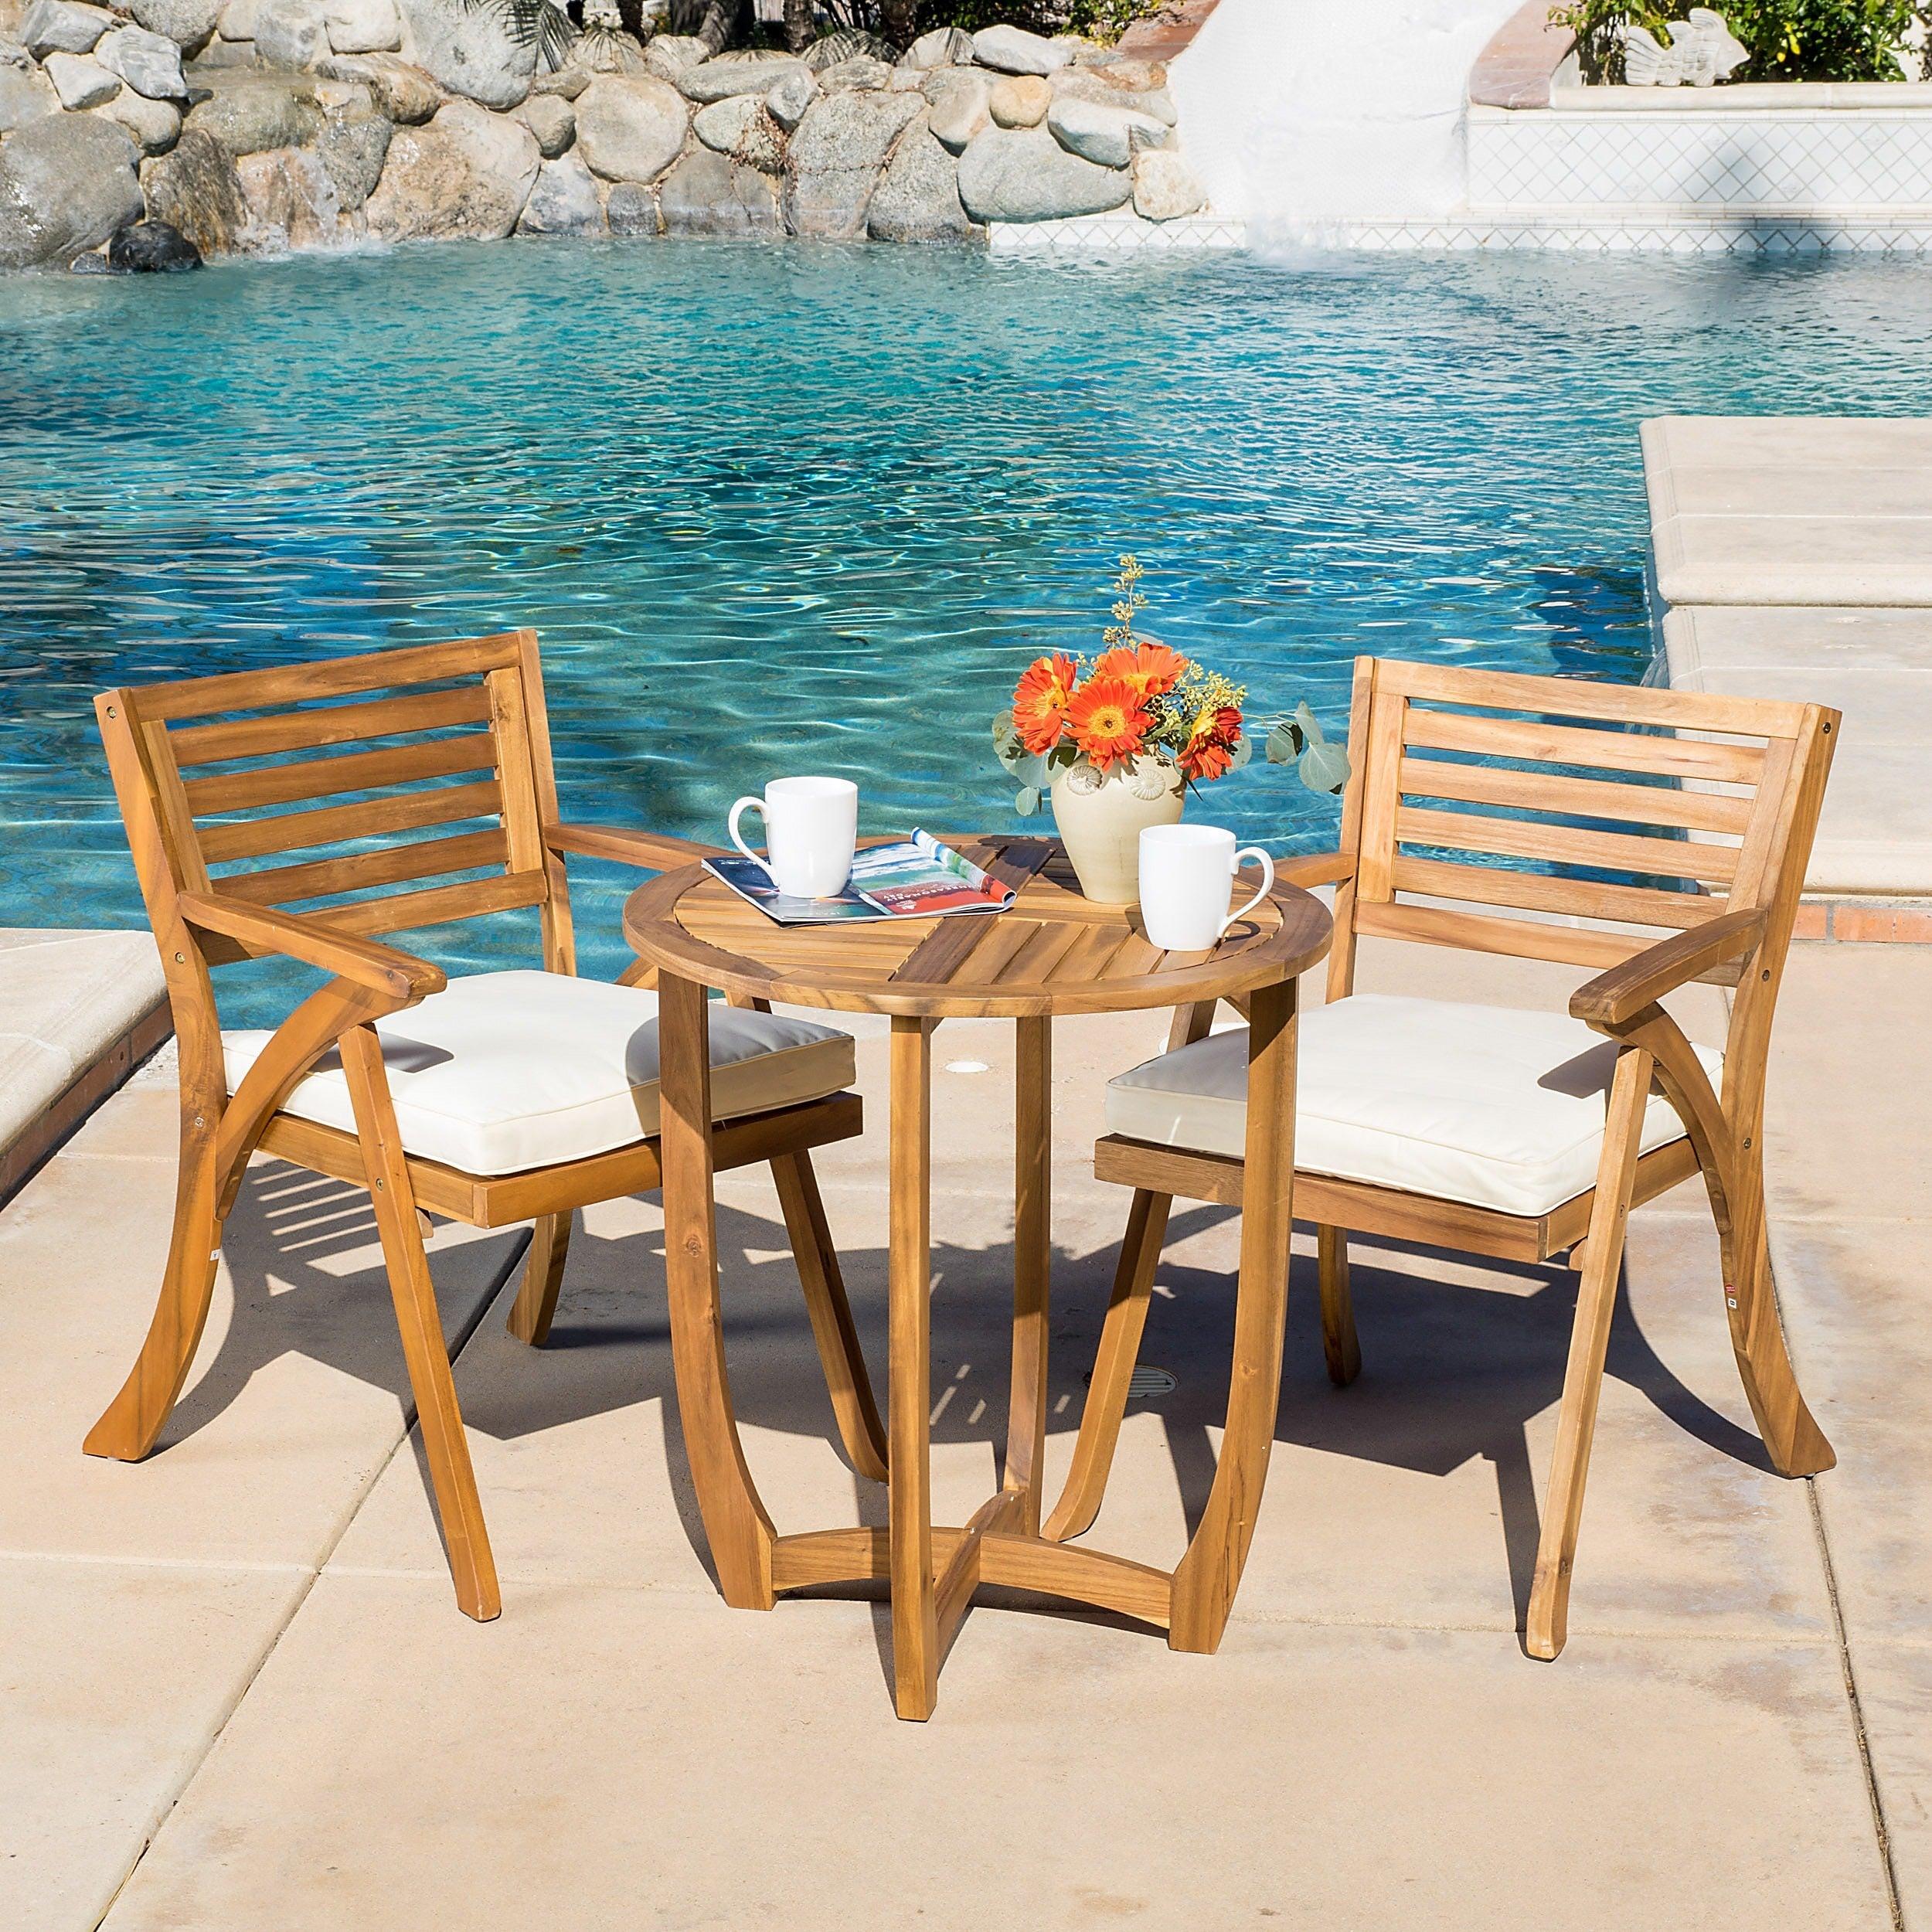 Coronado Outdoor 3-piece Acacia Wood Bistro Set with Cushions by ...